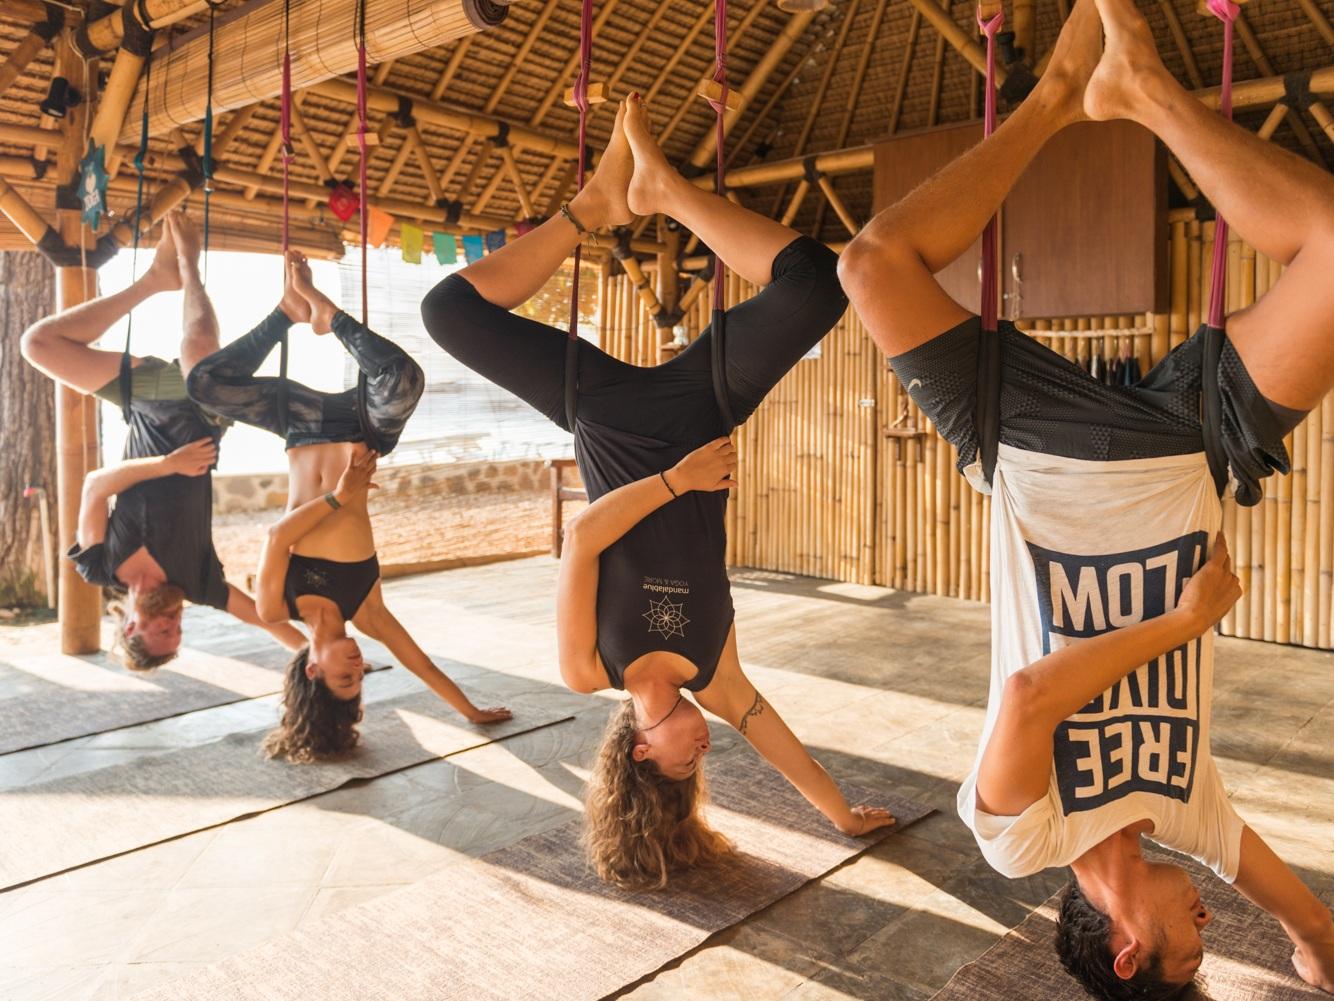 Mandalablue_yoga_beach_playa_tarifa_aerial_flyhigh.jpg